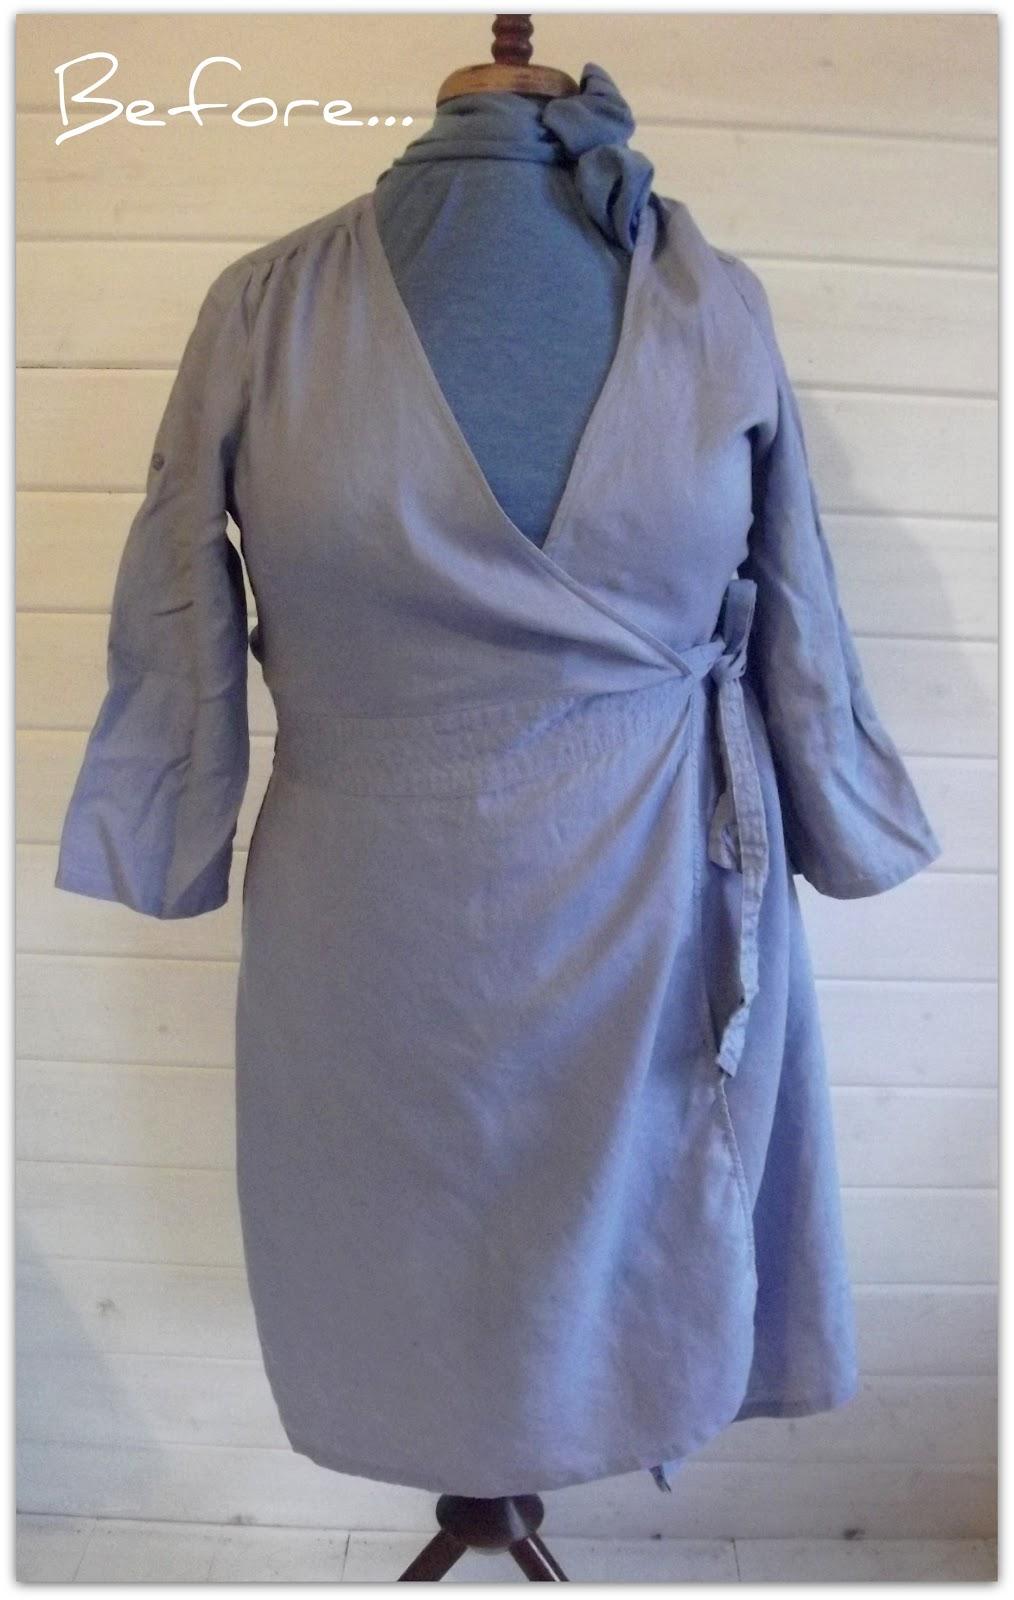 Linen Wrap Around Dress Pattern,Buy cheap Linen Wrap Around Dress